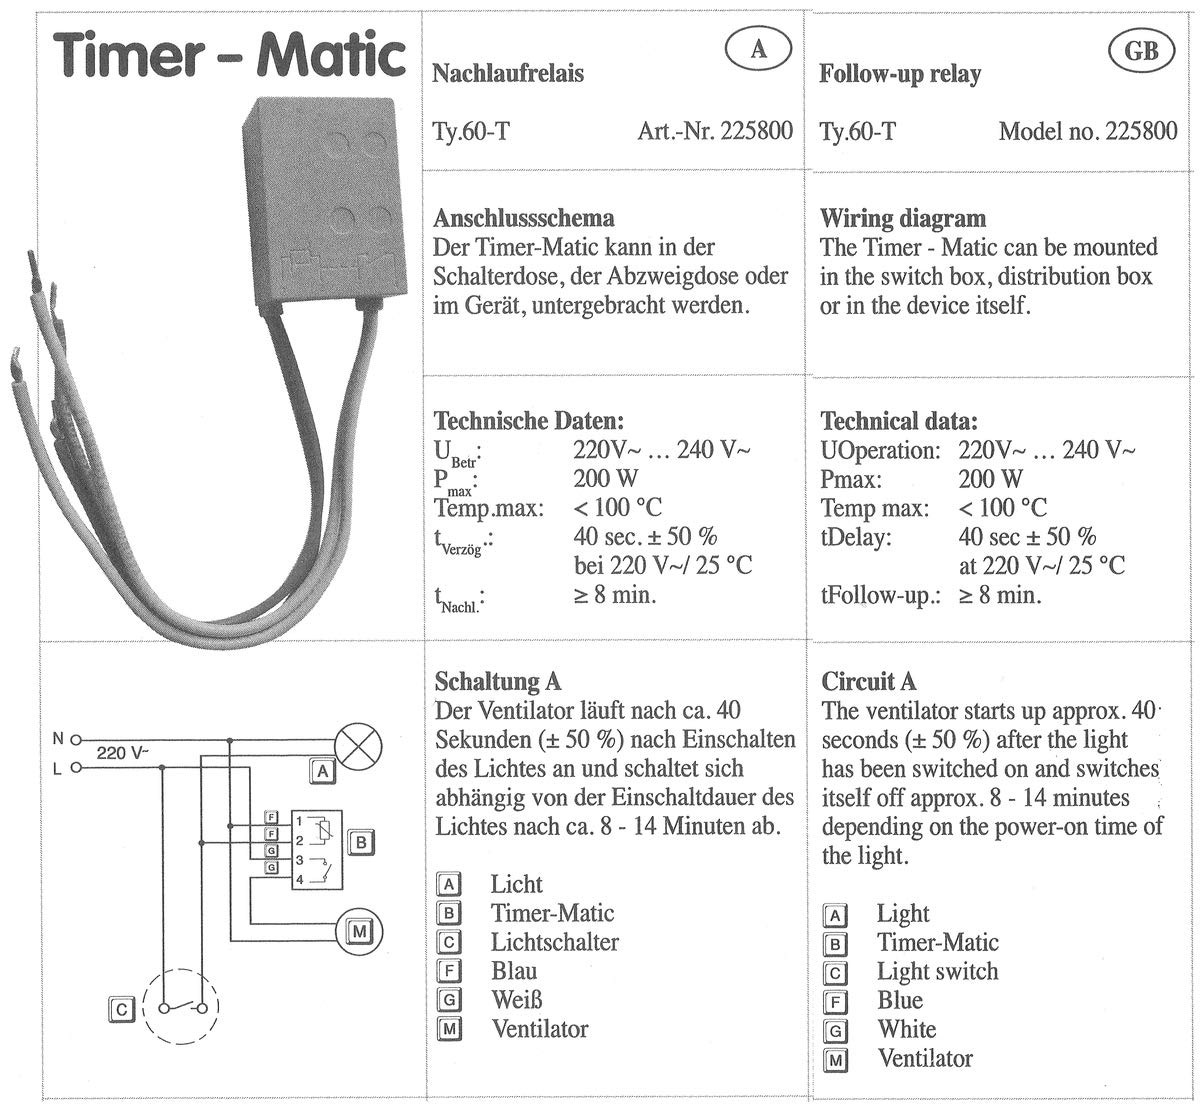 SiBliK TY.60-T Verzögerungsrelais Nachlaufrelais: Amazon.de: Elektronik